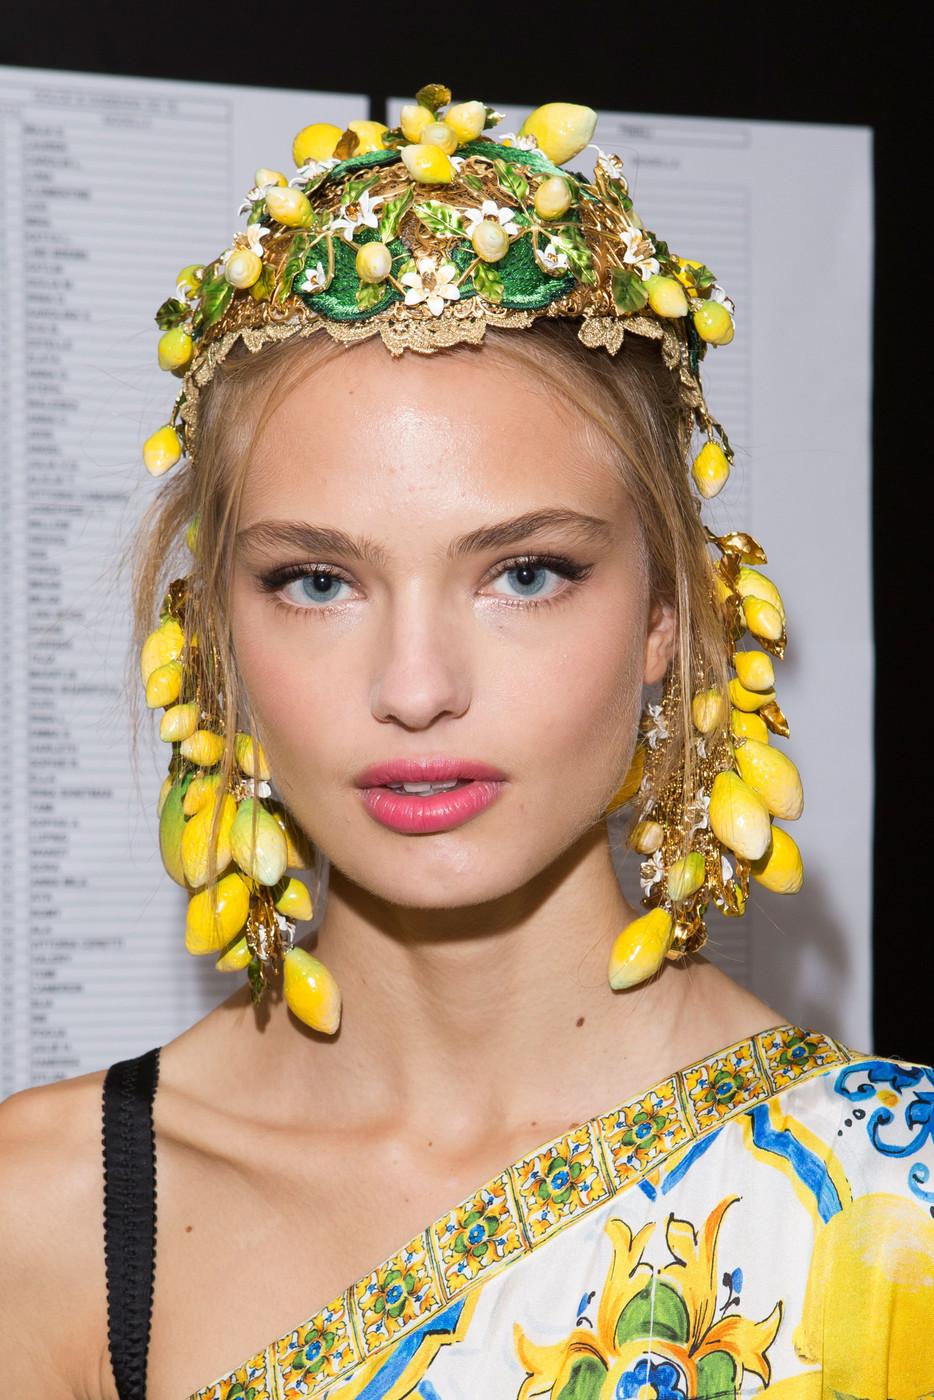 Dolce+Gabbana+Spring+2016+Backstage+TLo2FIcYvbEx.jpg